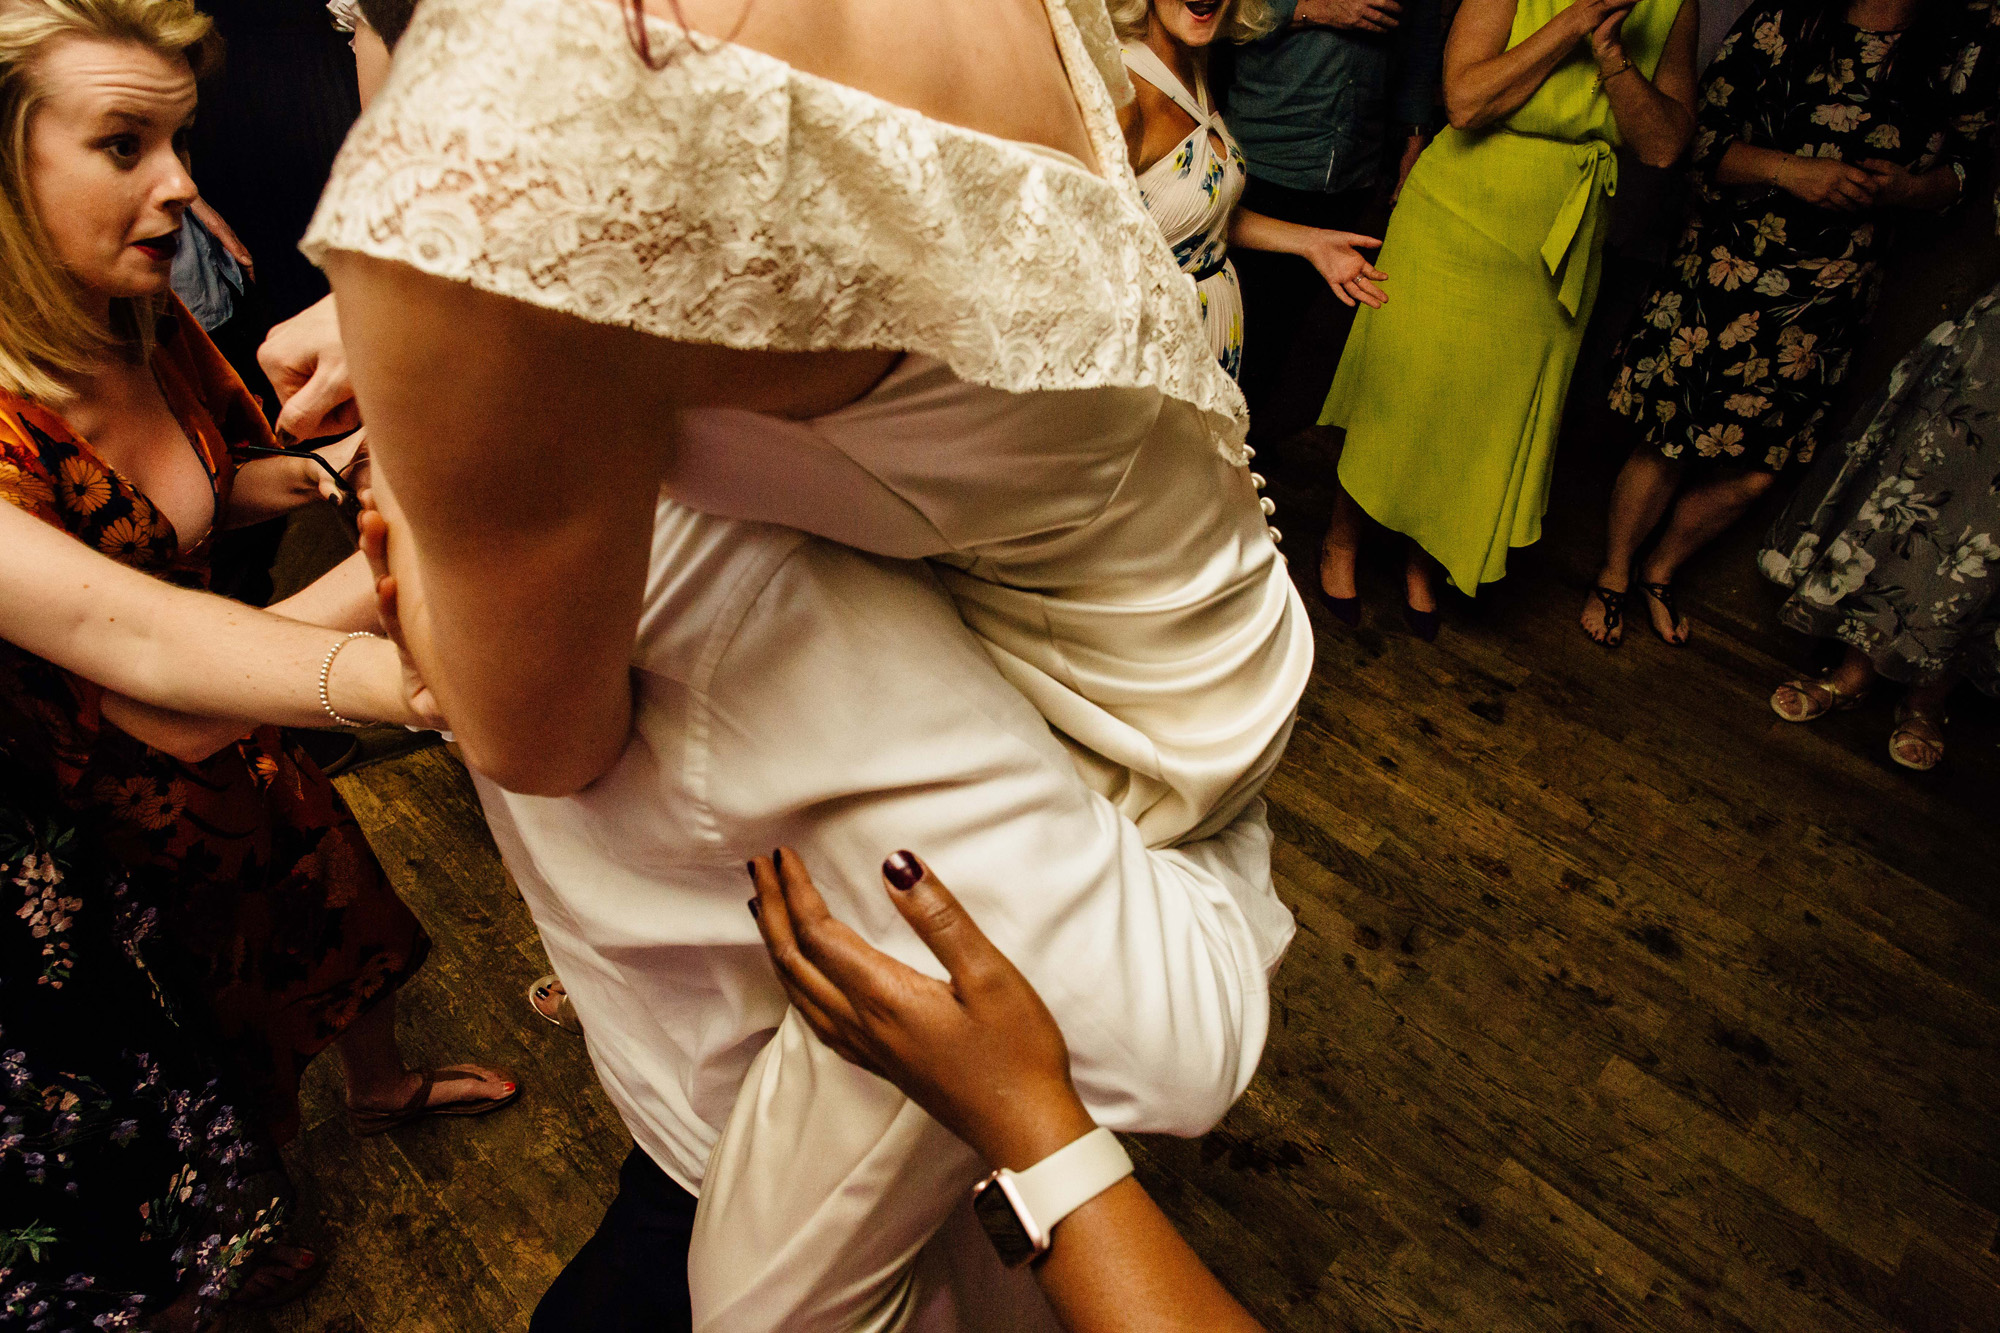 Sarah-Honeysuckle-Bias-Cut-Silk-Vintage-Inspired-Wedding-Gown-Sheffield-Wedding-Kate-Beaumont-67.jpg